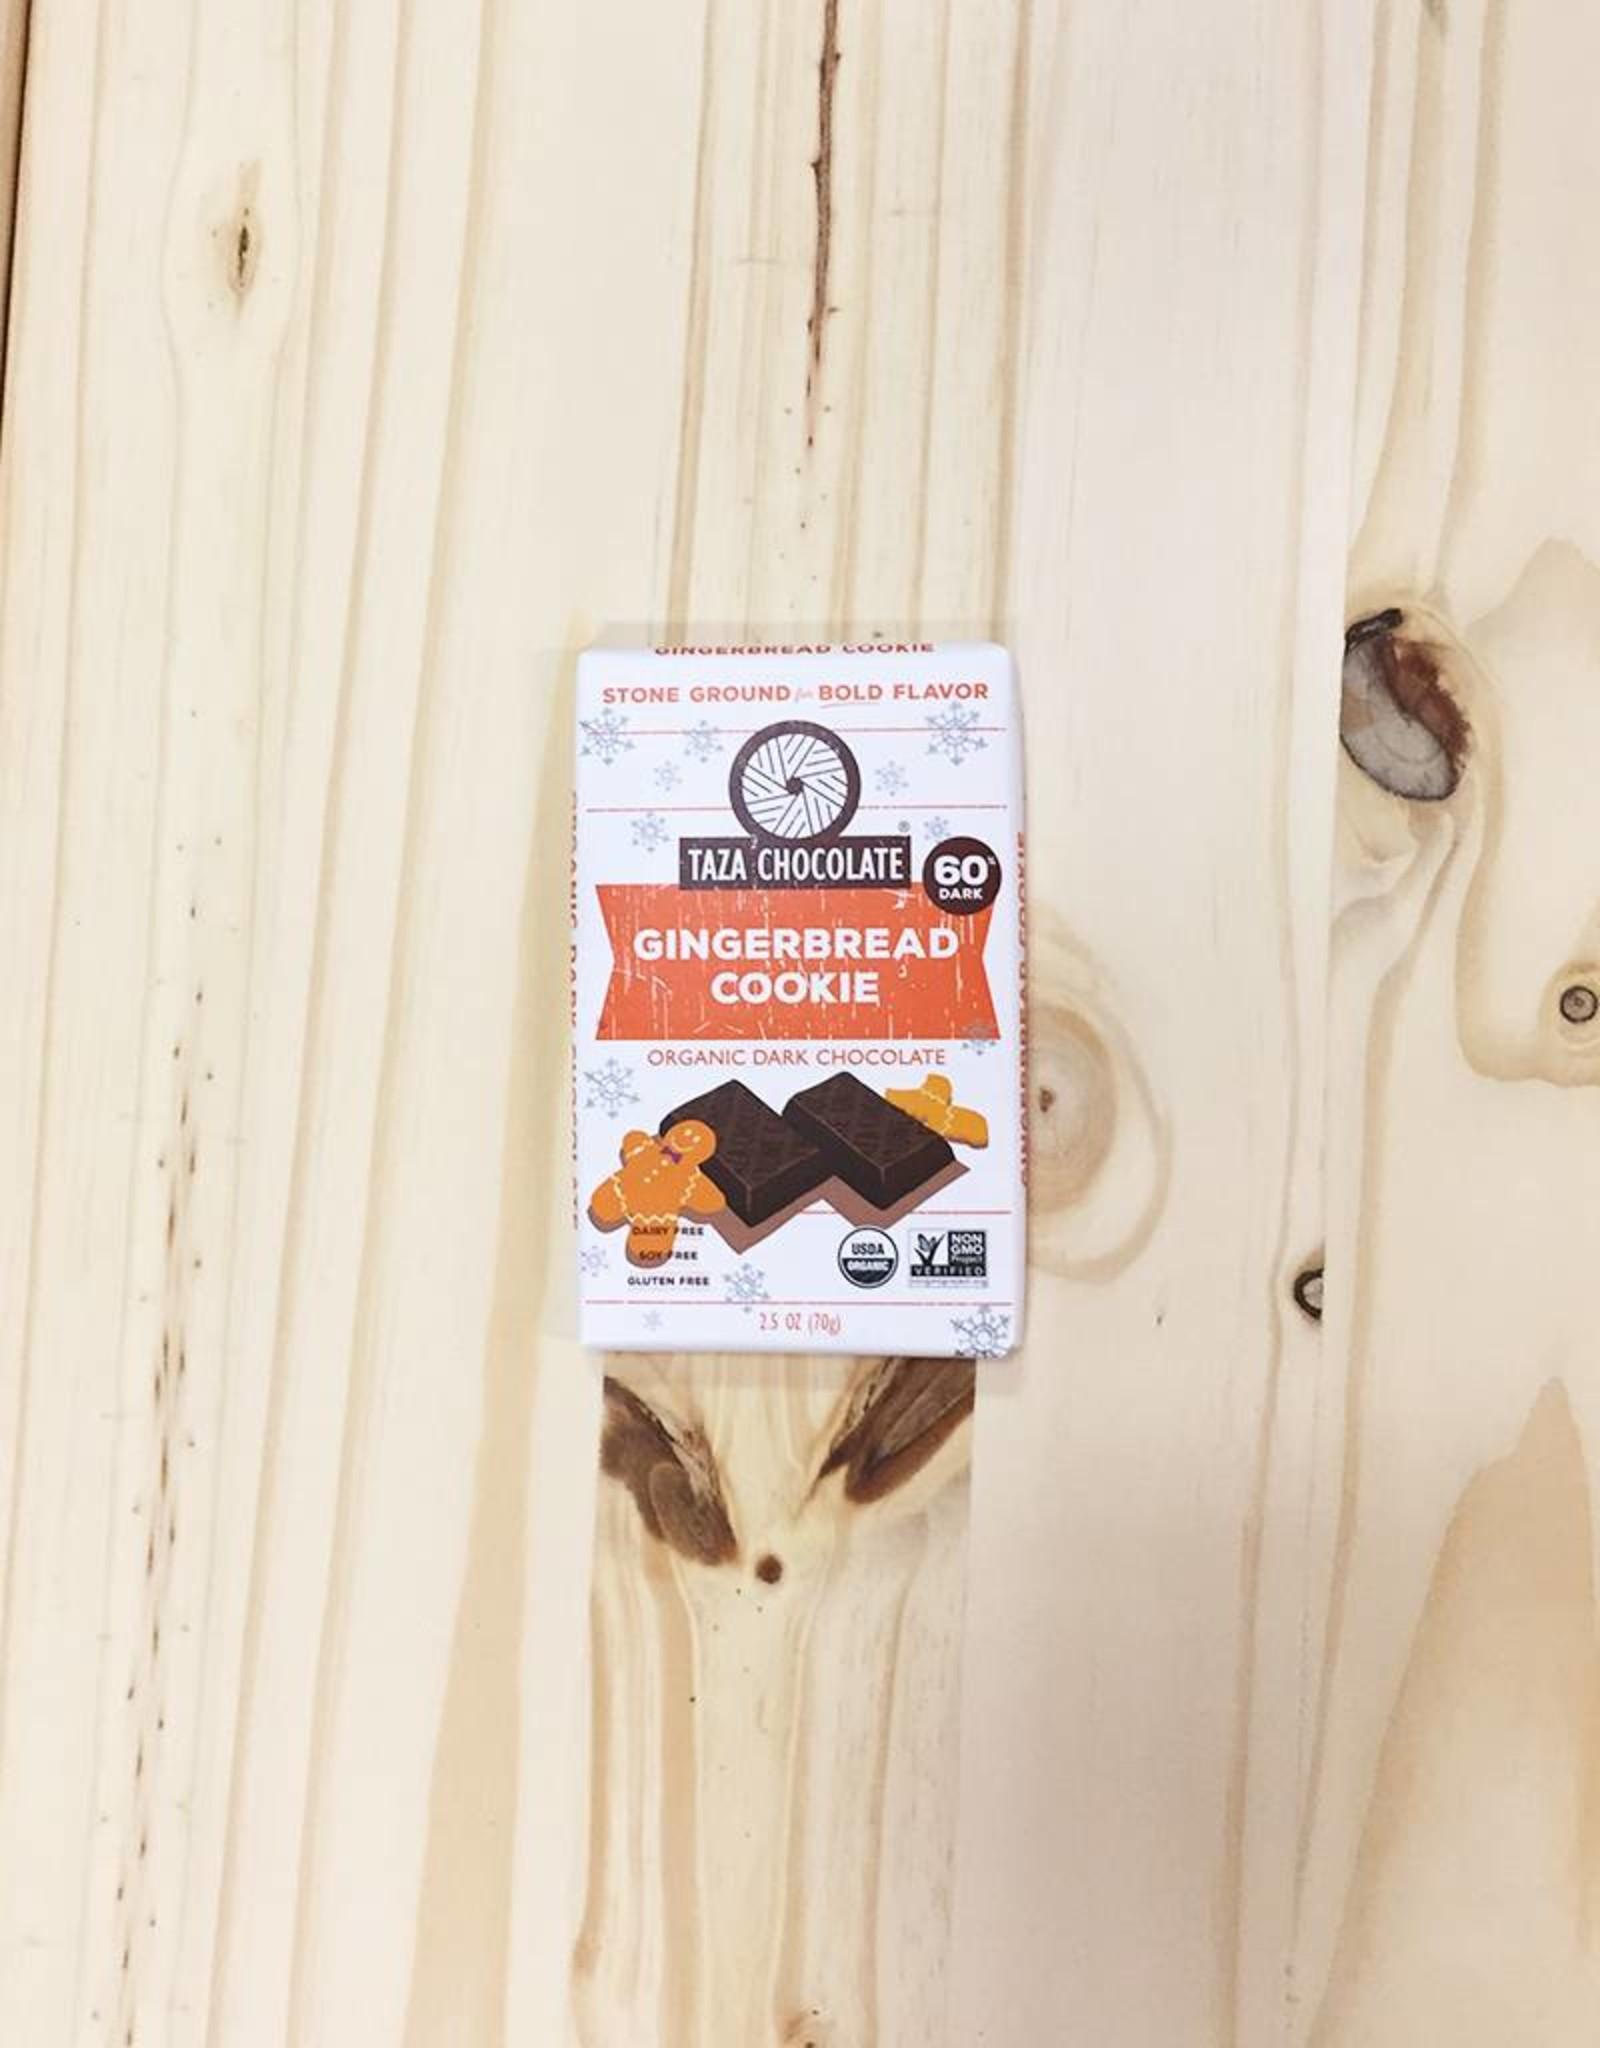 Taza Chocolate Taza Chocolate 2.5 oz (Gingerbread Cookie)